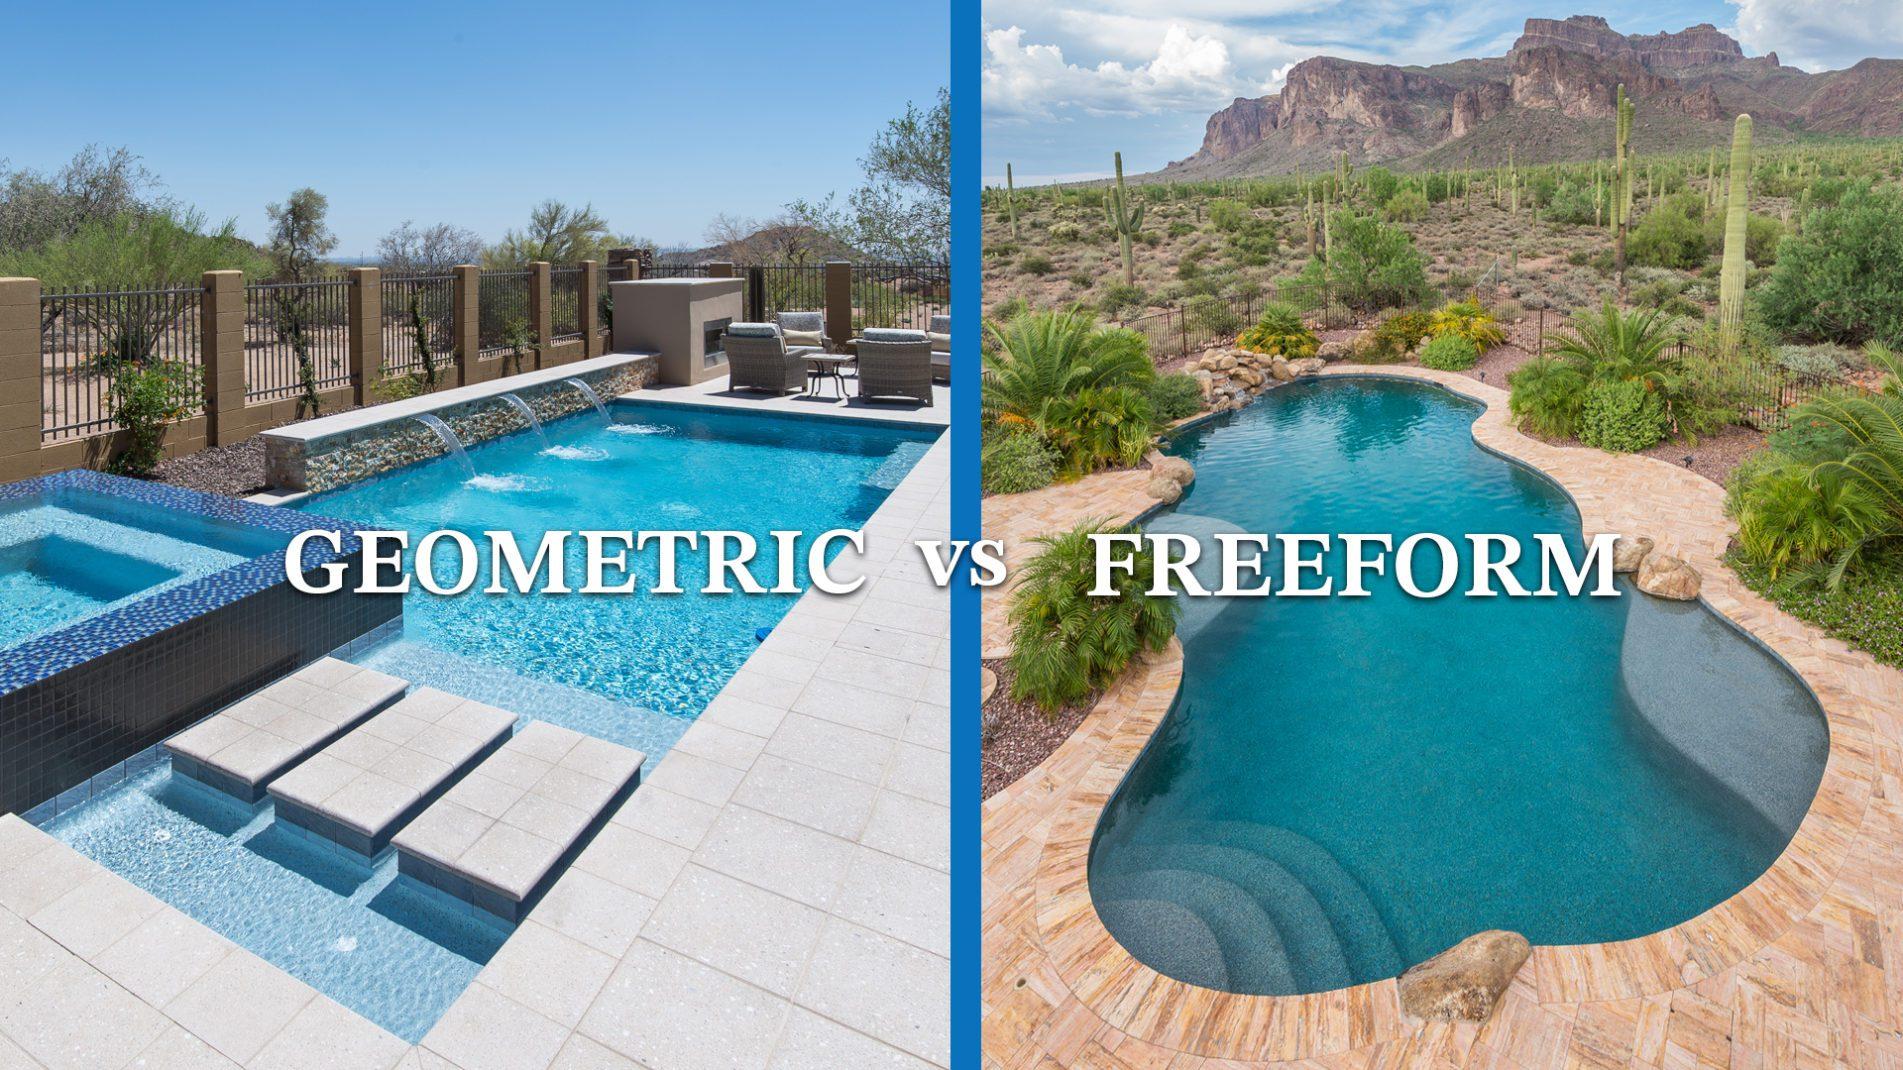 Geometric VS Freeform